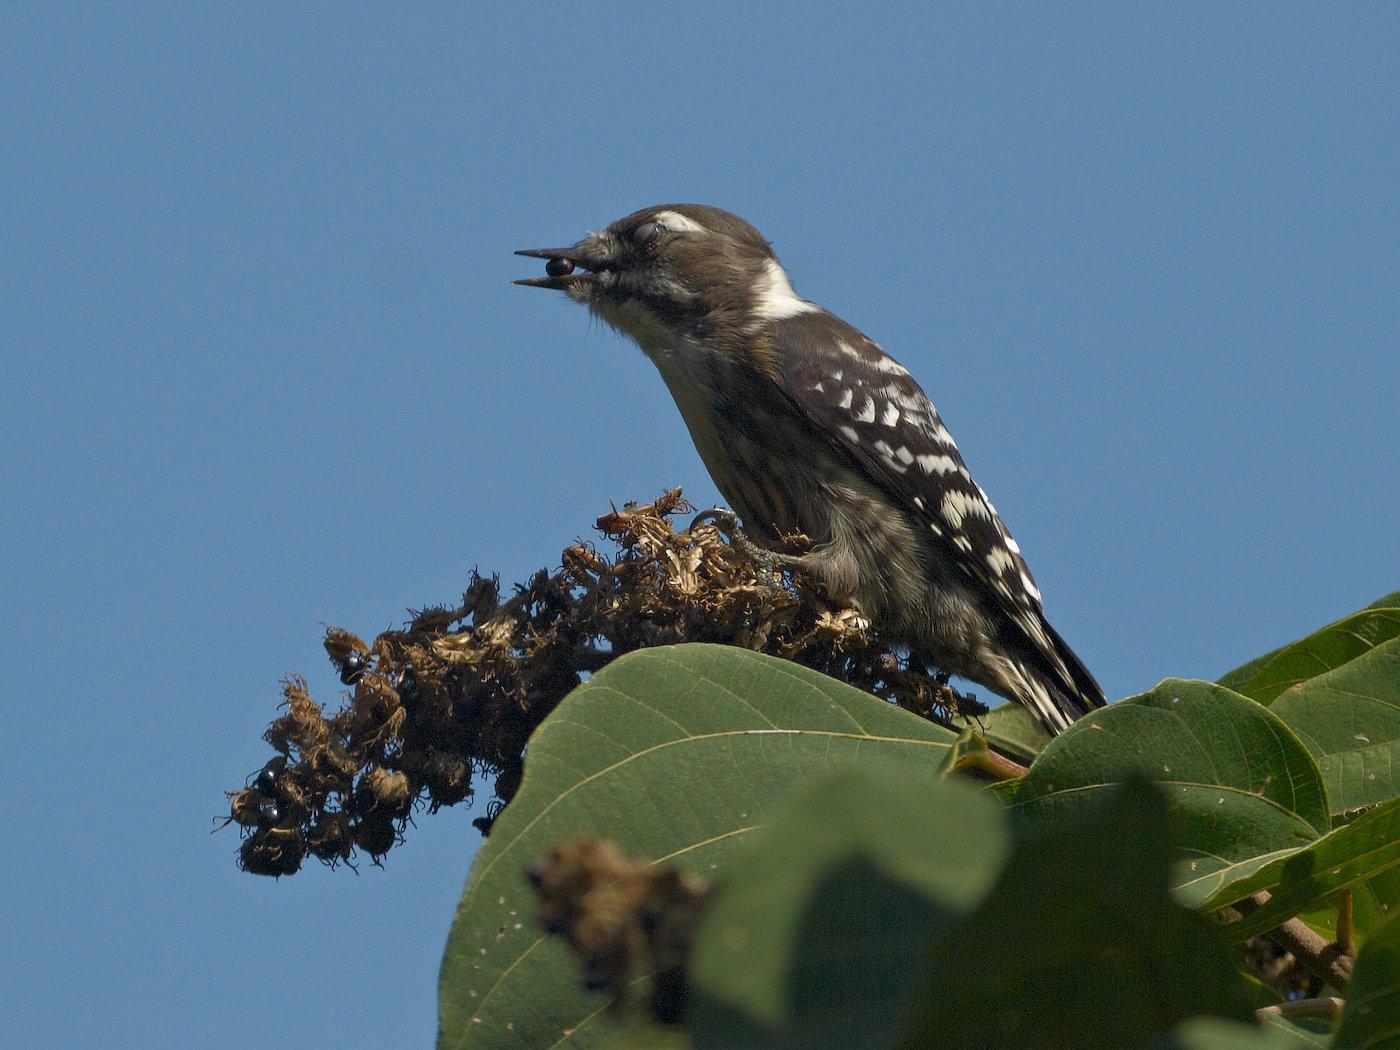 BORG71FLで撮影した野鳥・コゲラの写真画像